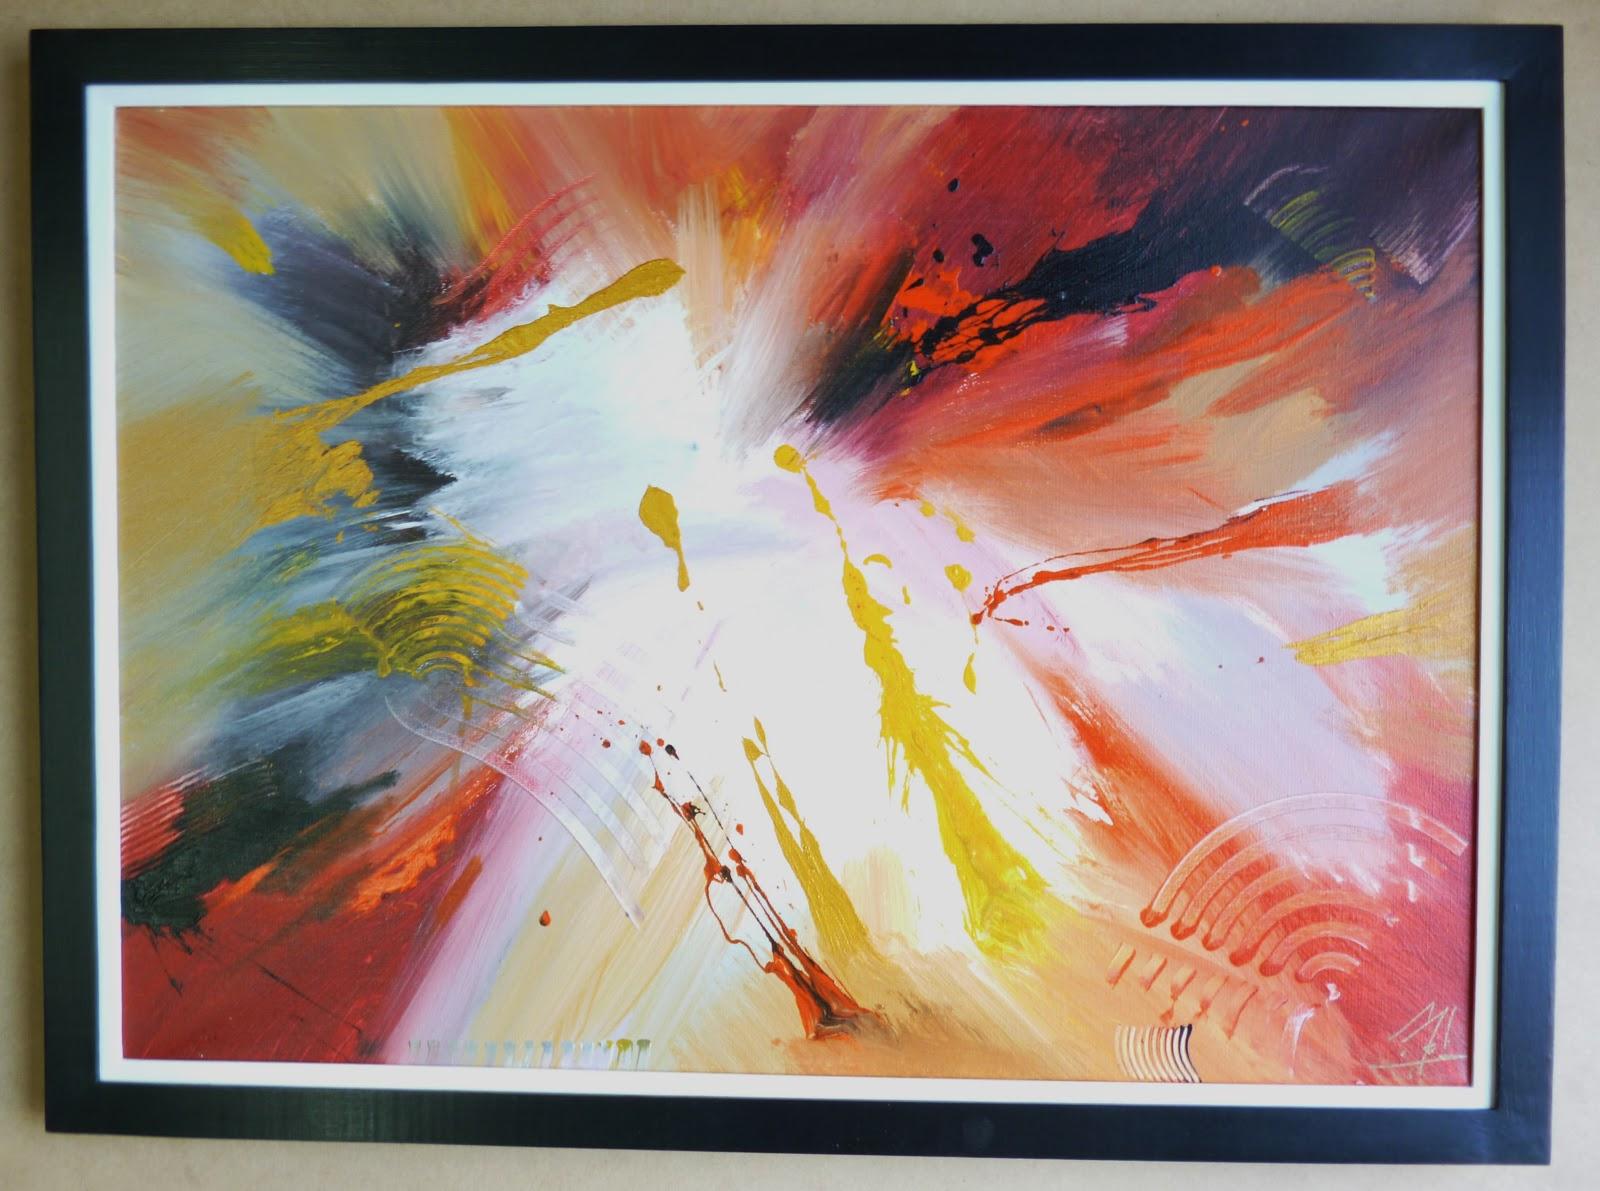 Marcos para cuadros abstractos imagui for Cuadros abstractos con marco